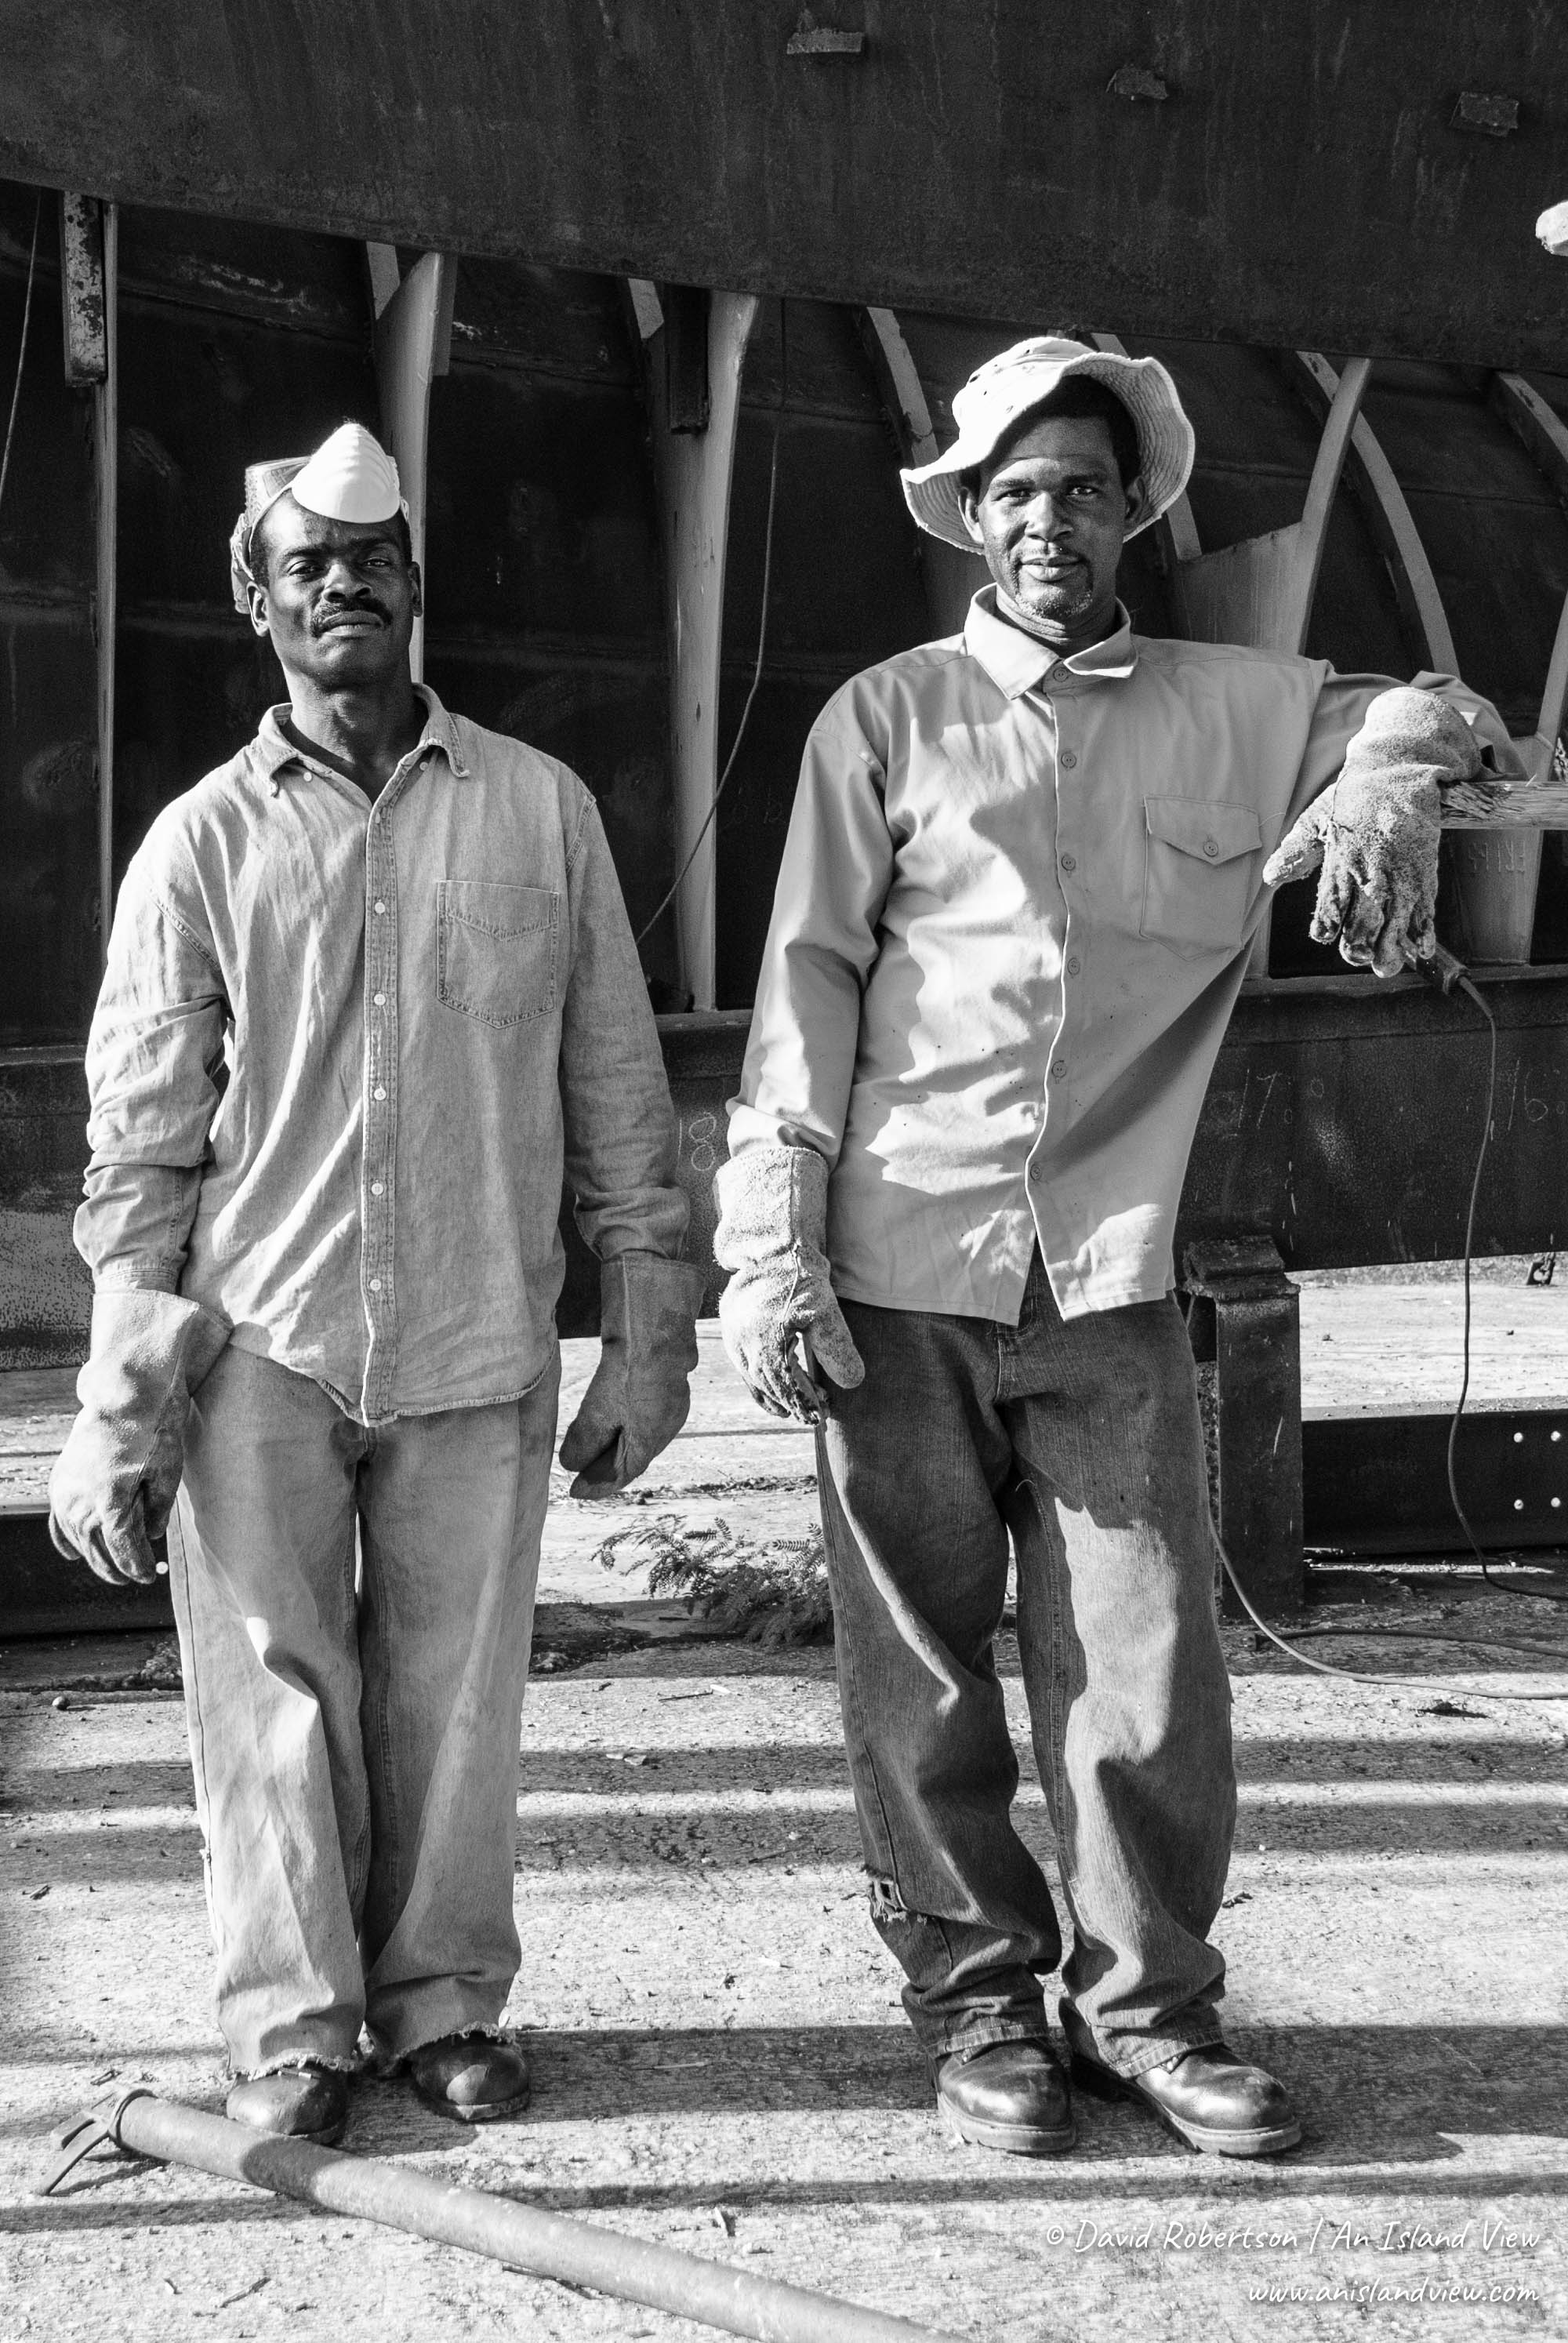 Boat builders in Barbados.